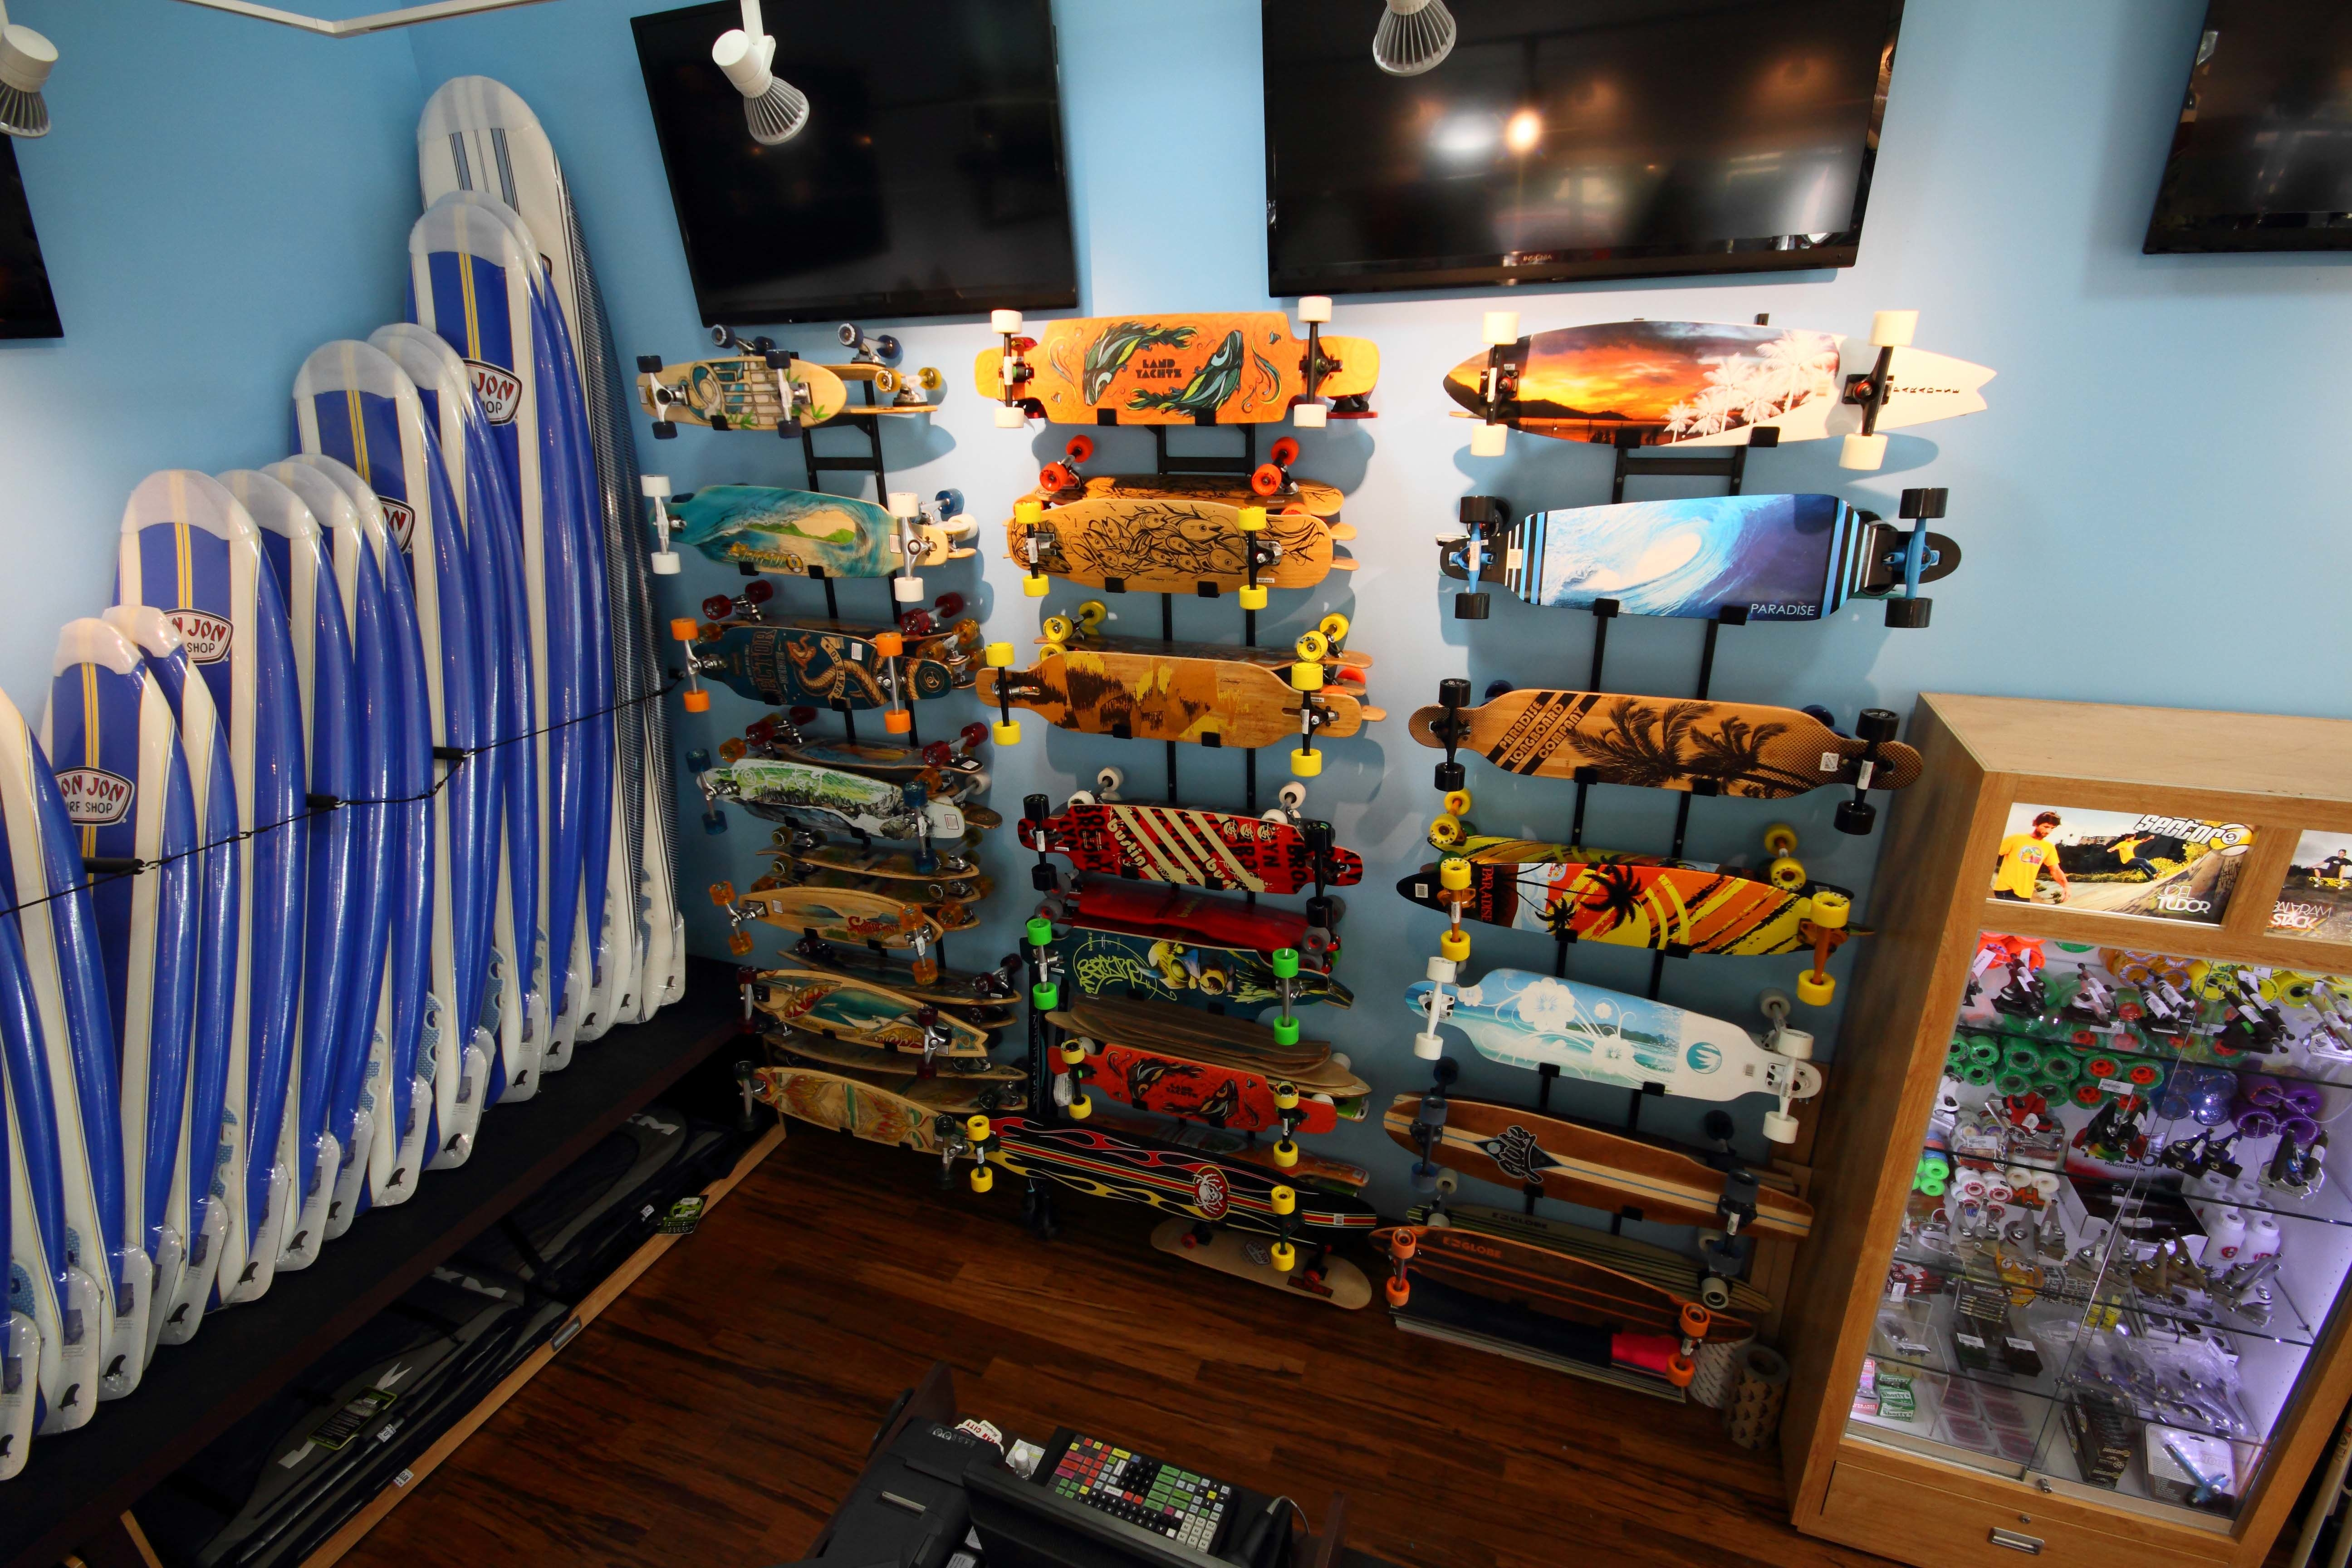 Ron Jon Surf Shop image 3